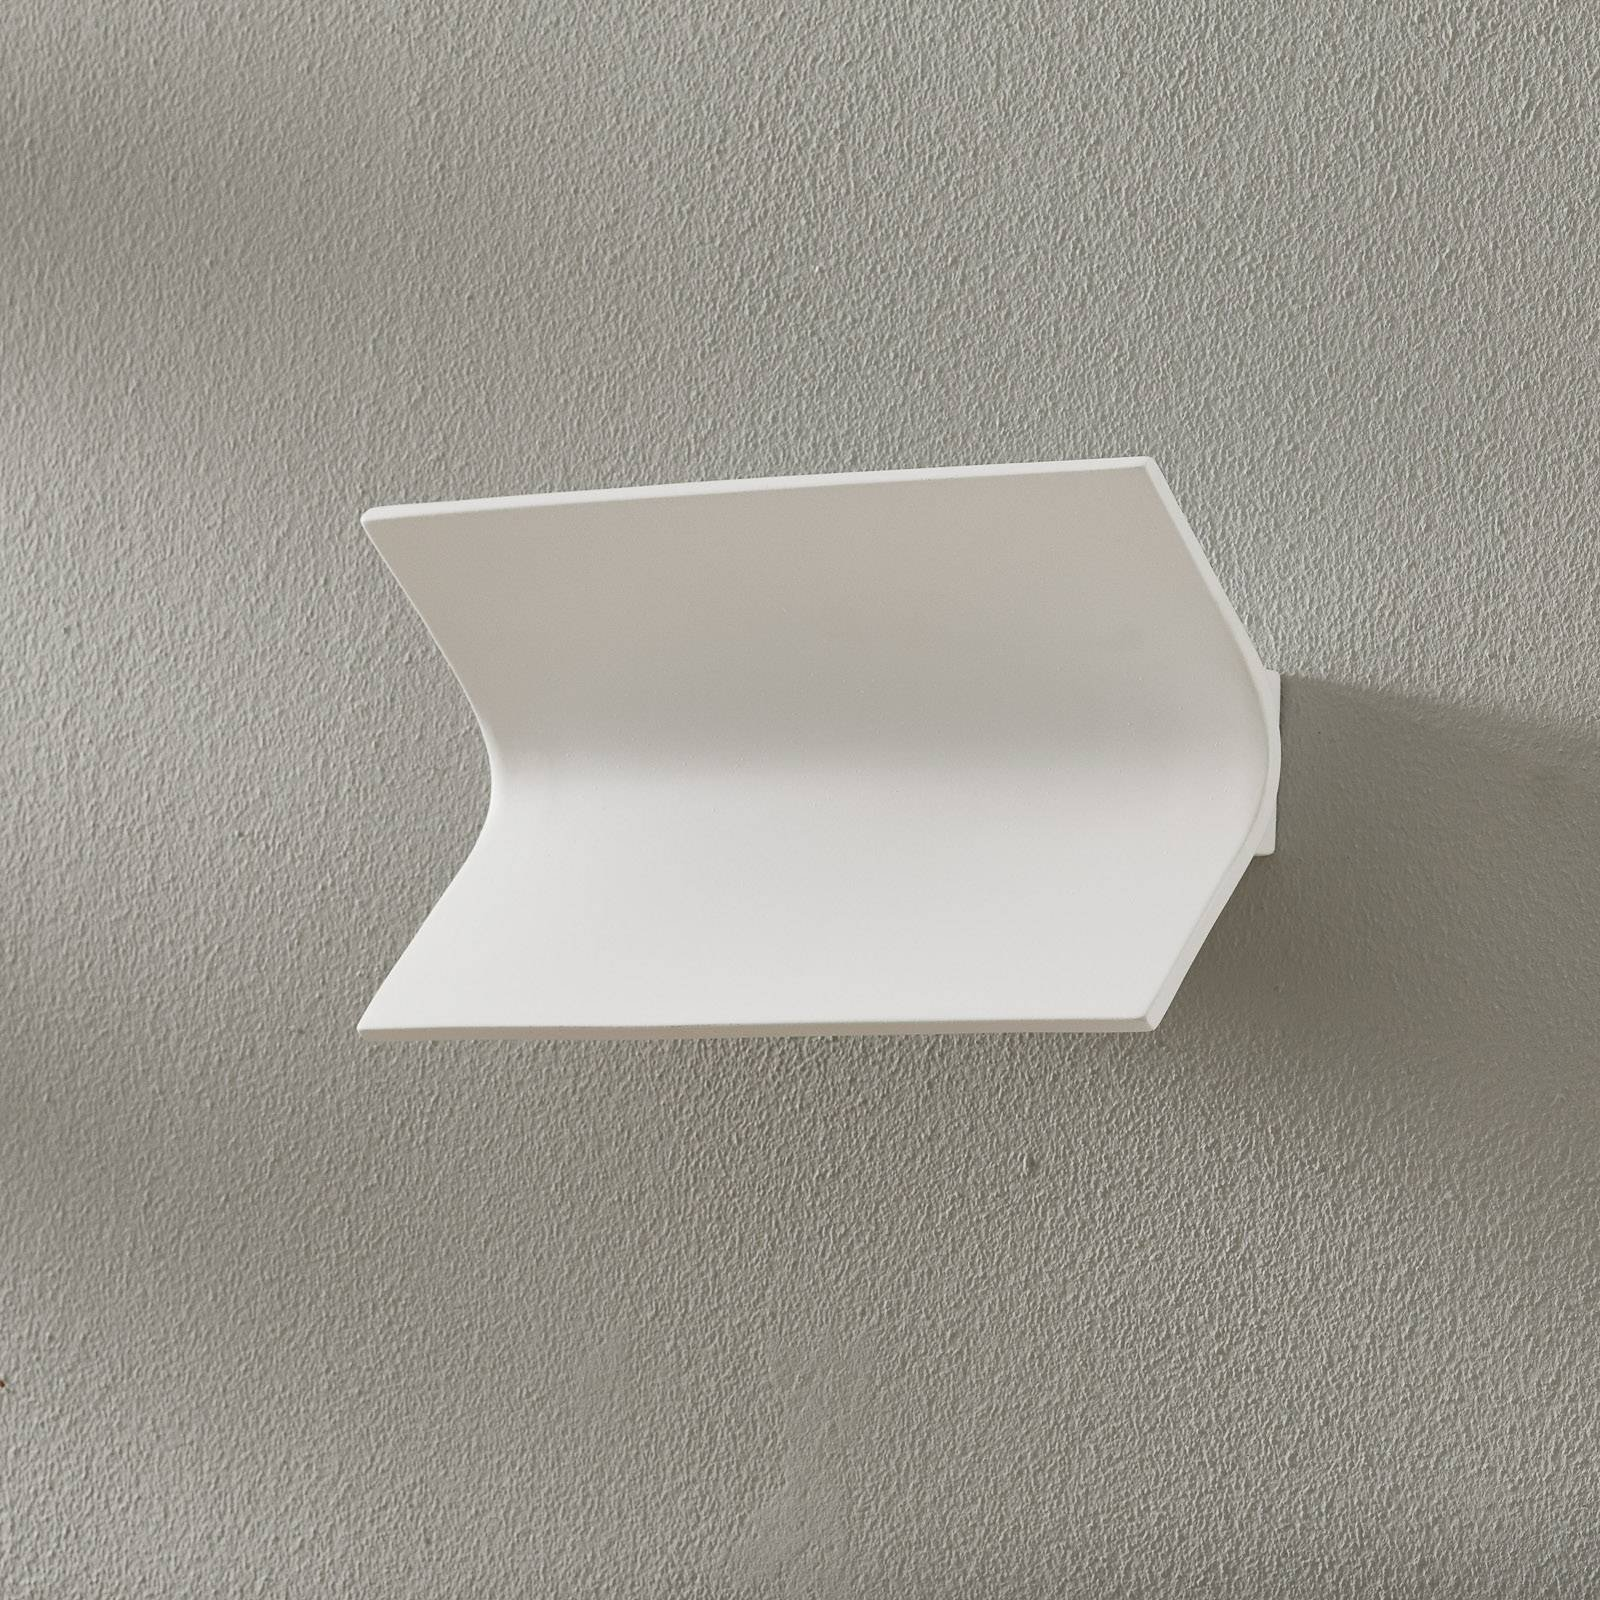 LED-vegglampe 2497, keramikk 2 700 K, dimbar